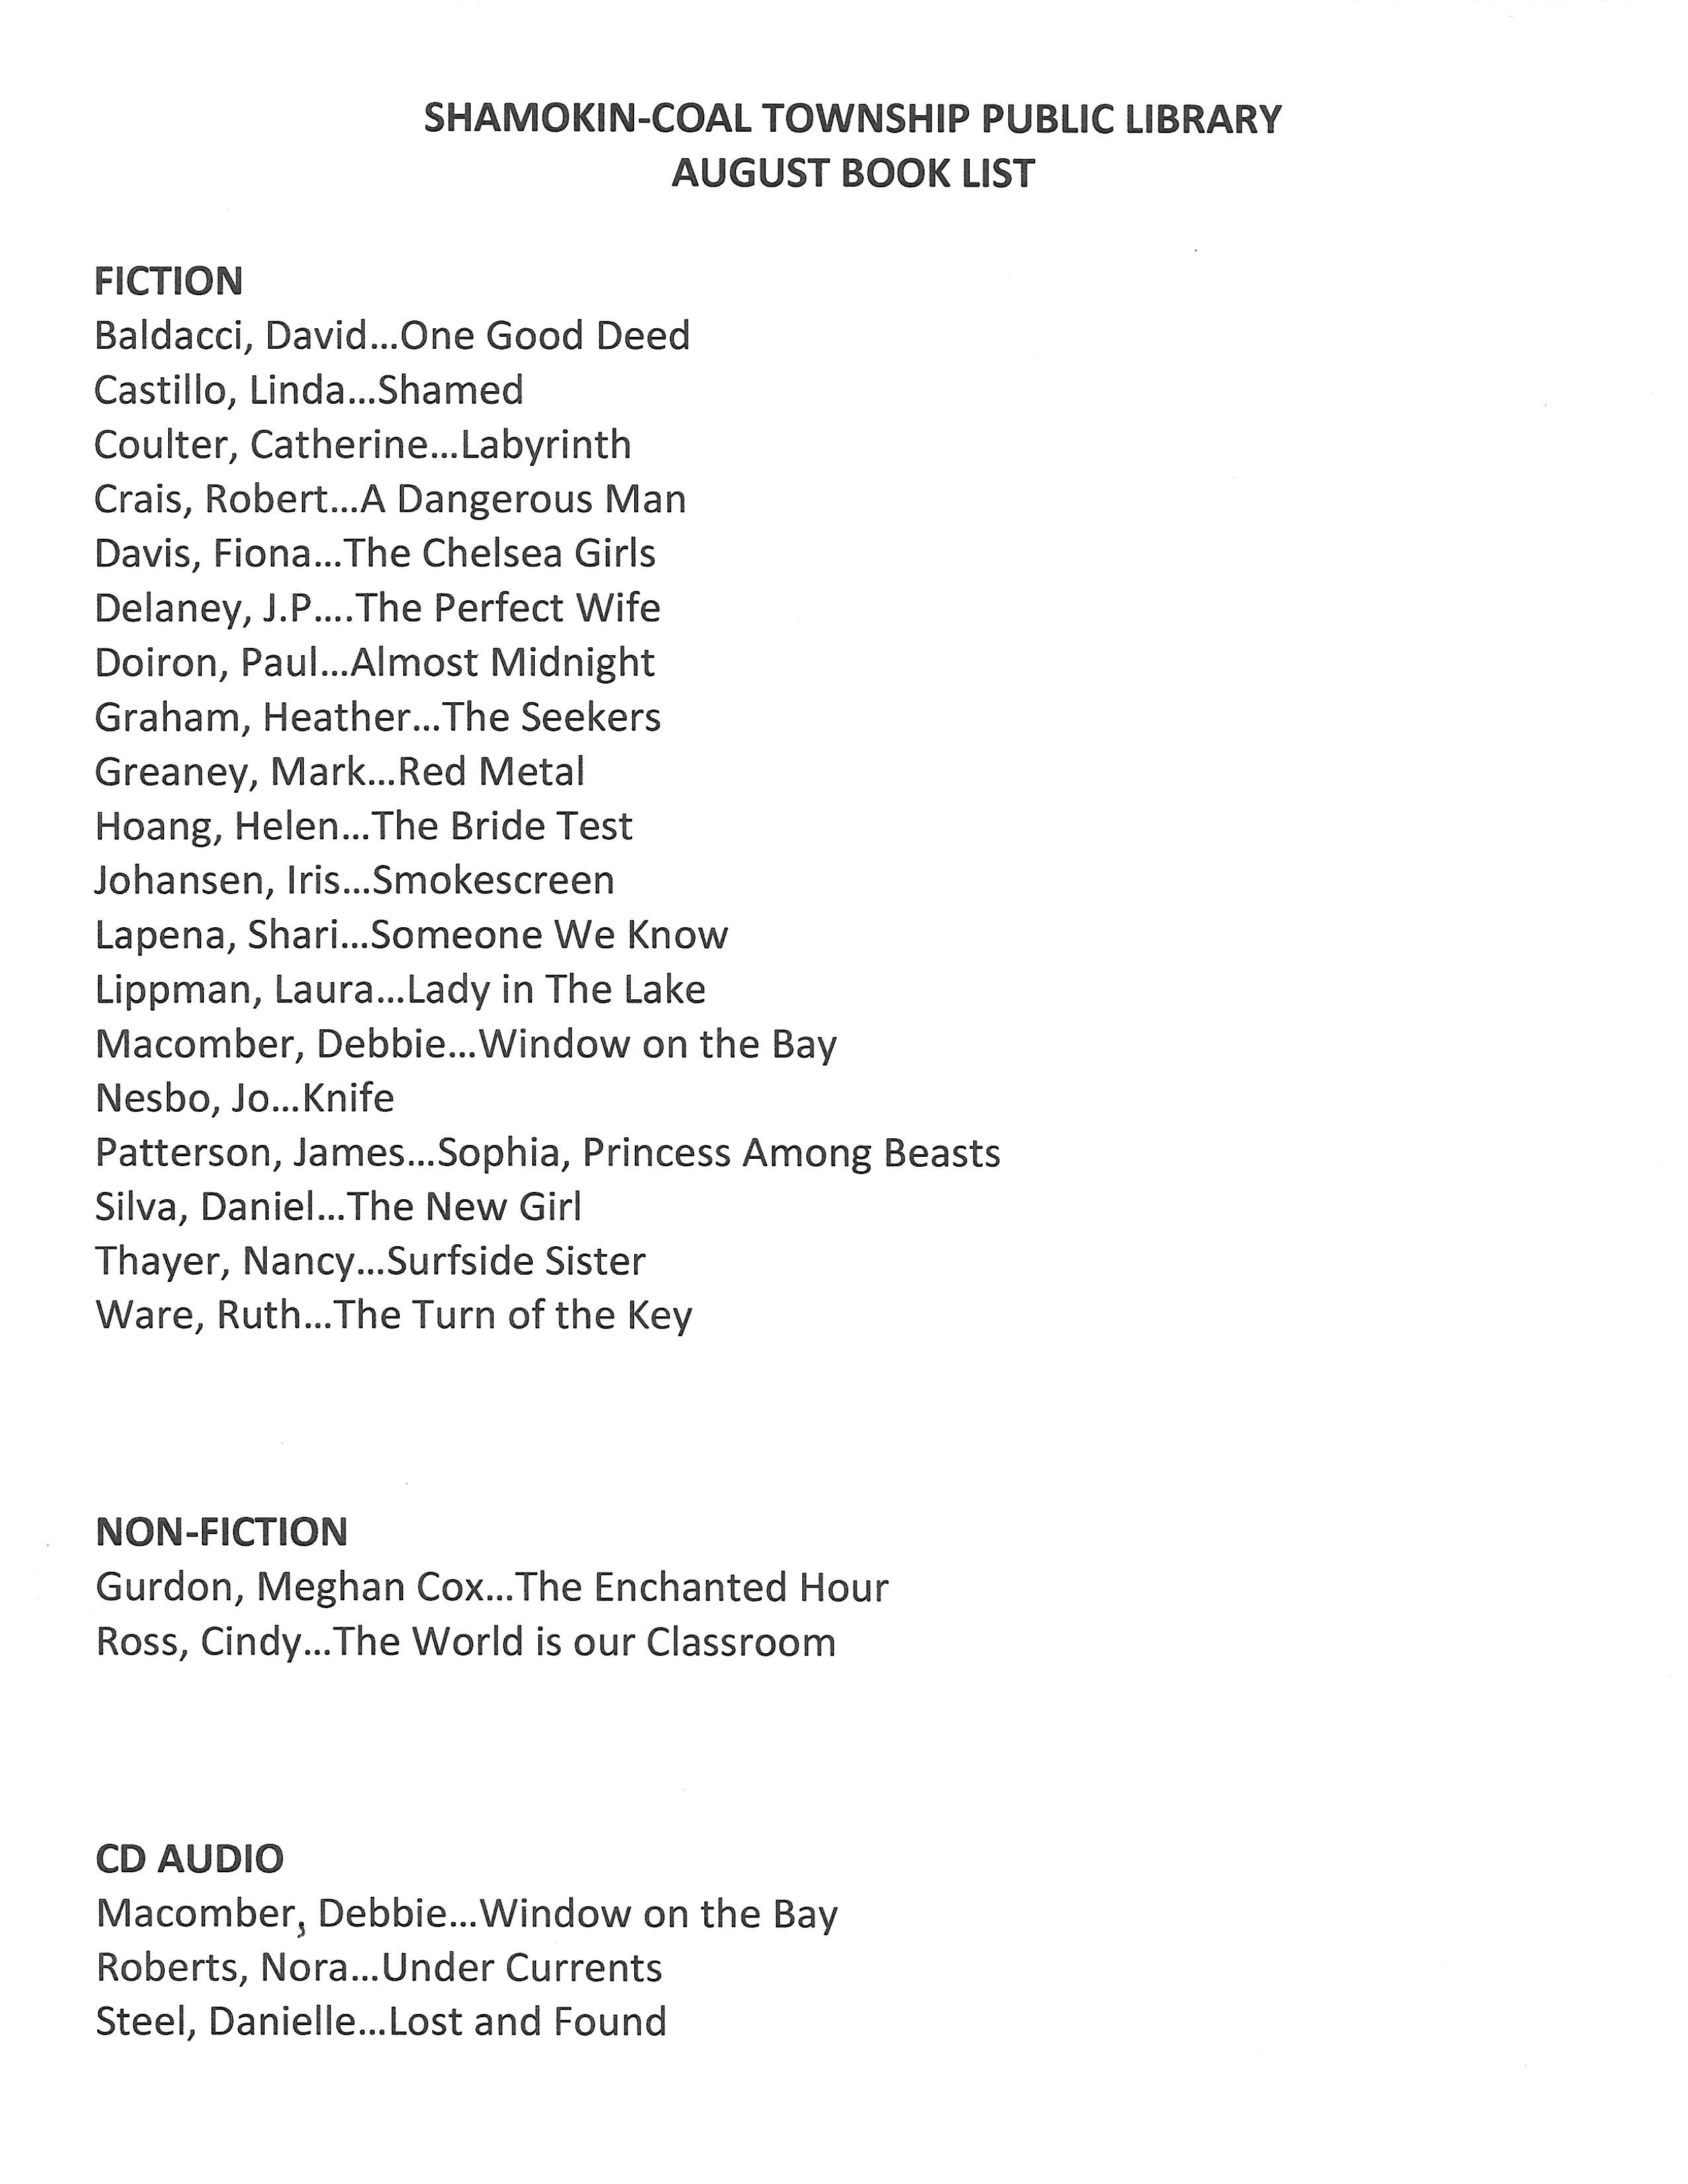 August 2019 Book List